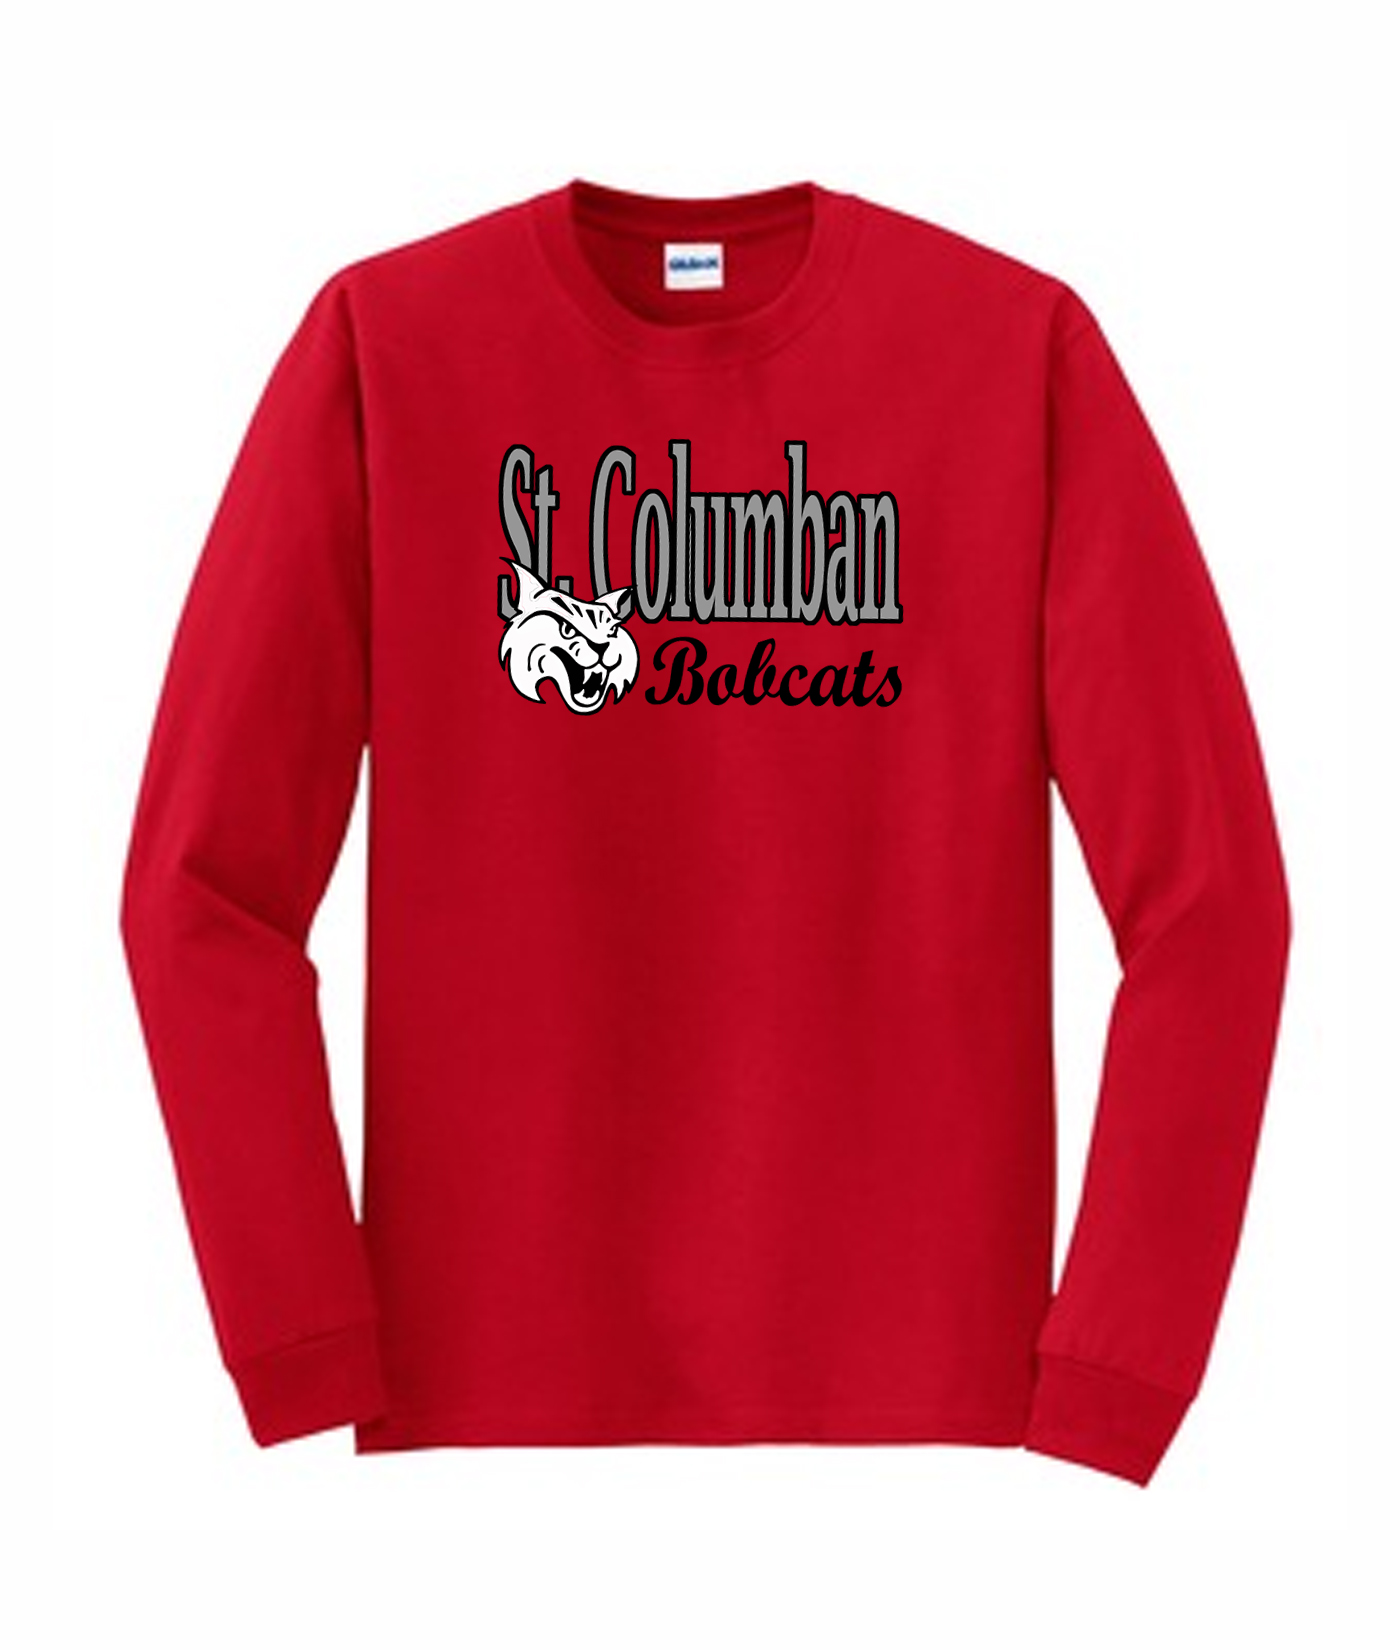 Red Gildan Long Sleeve T-Shirt Bobcat_Bobcats